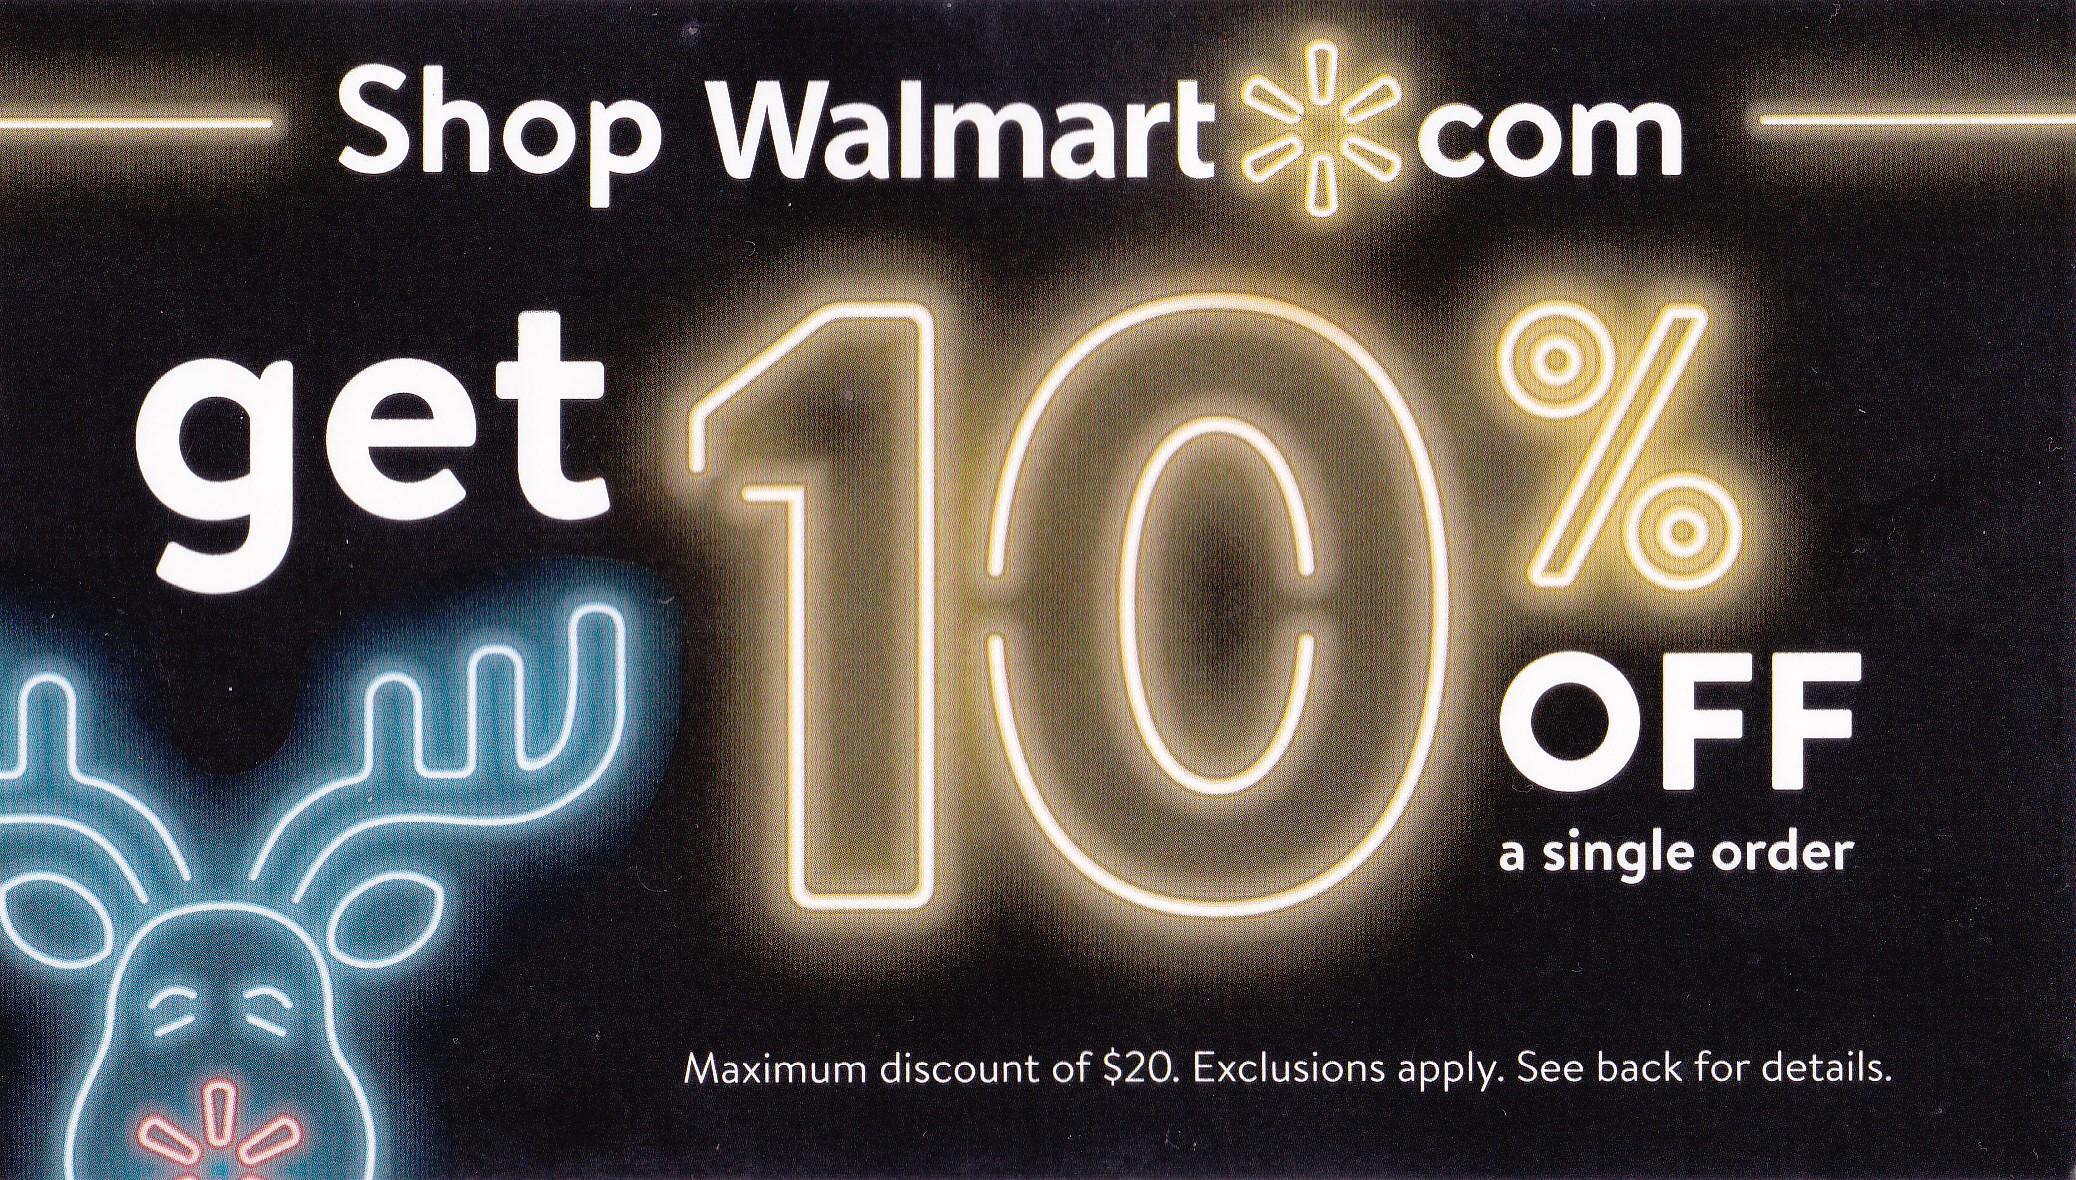 coupon.jpg